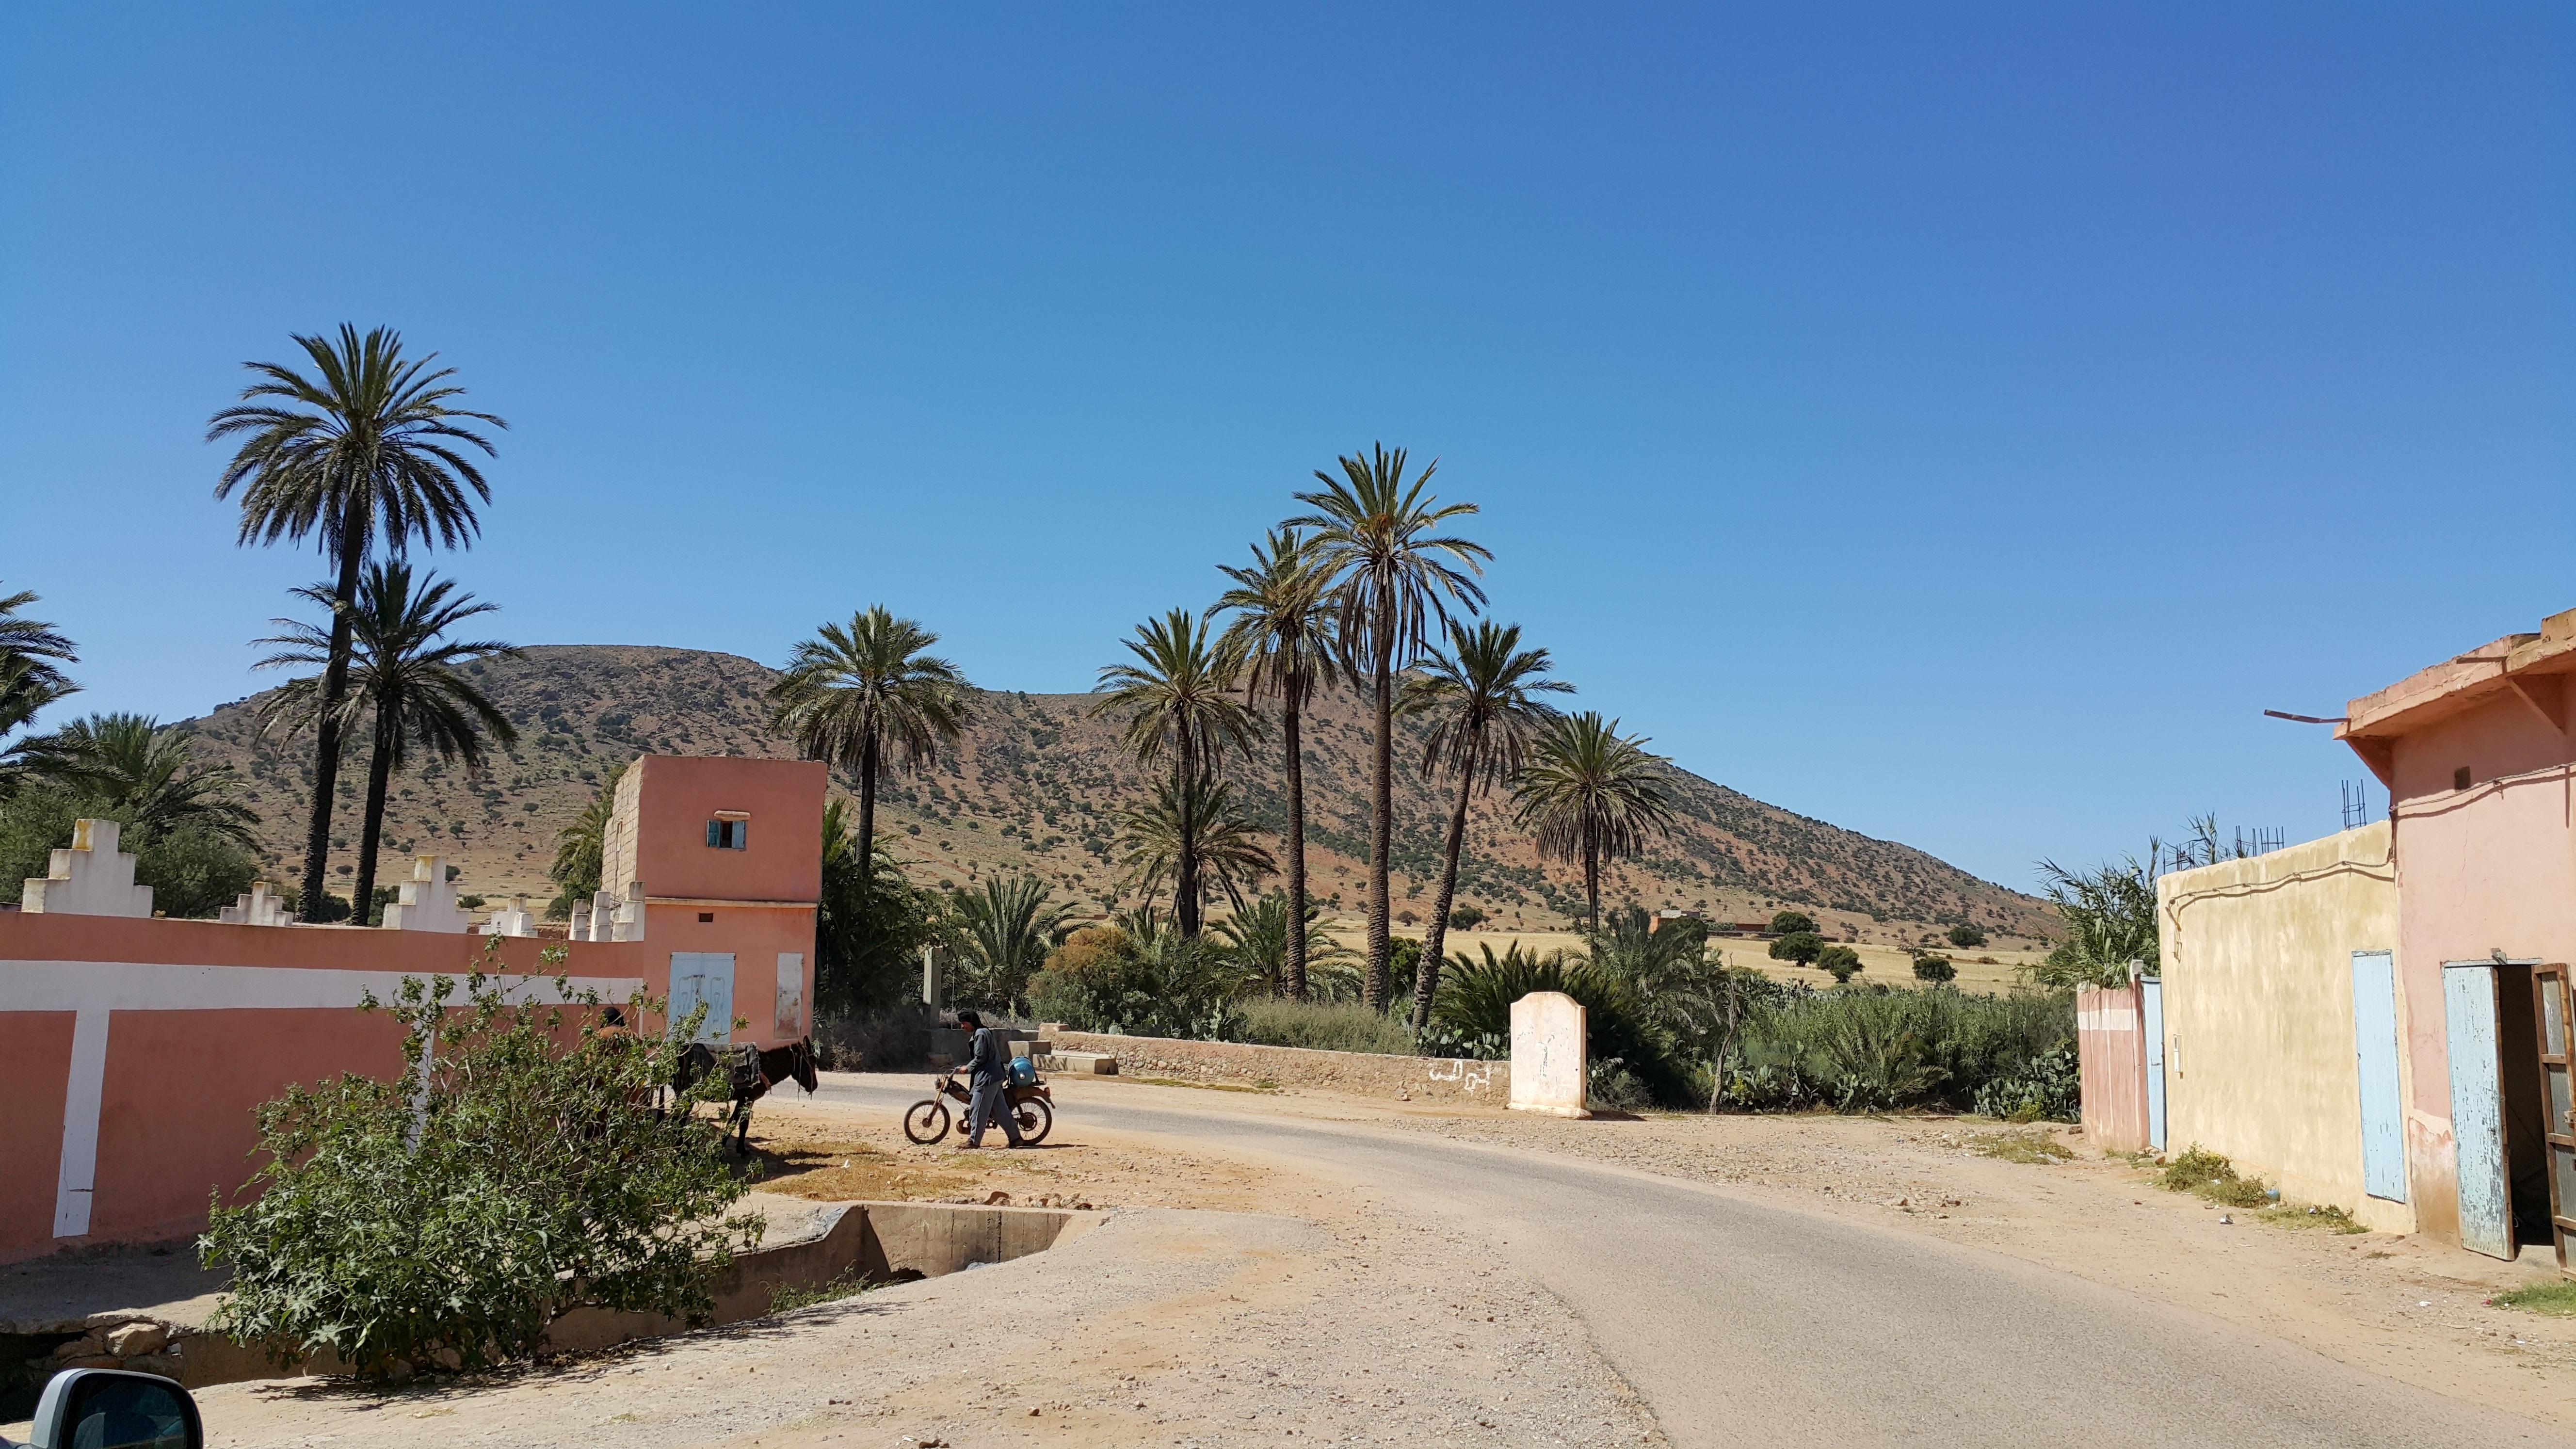 Marokko dating gratis